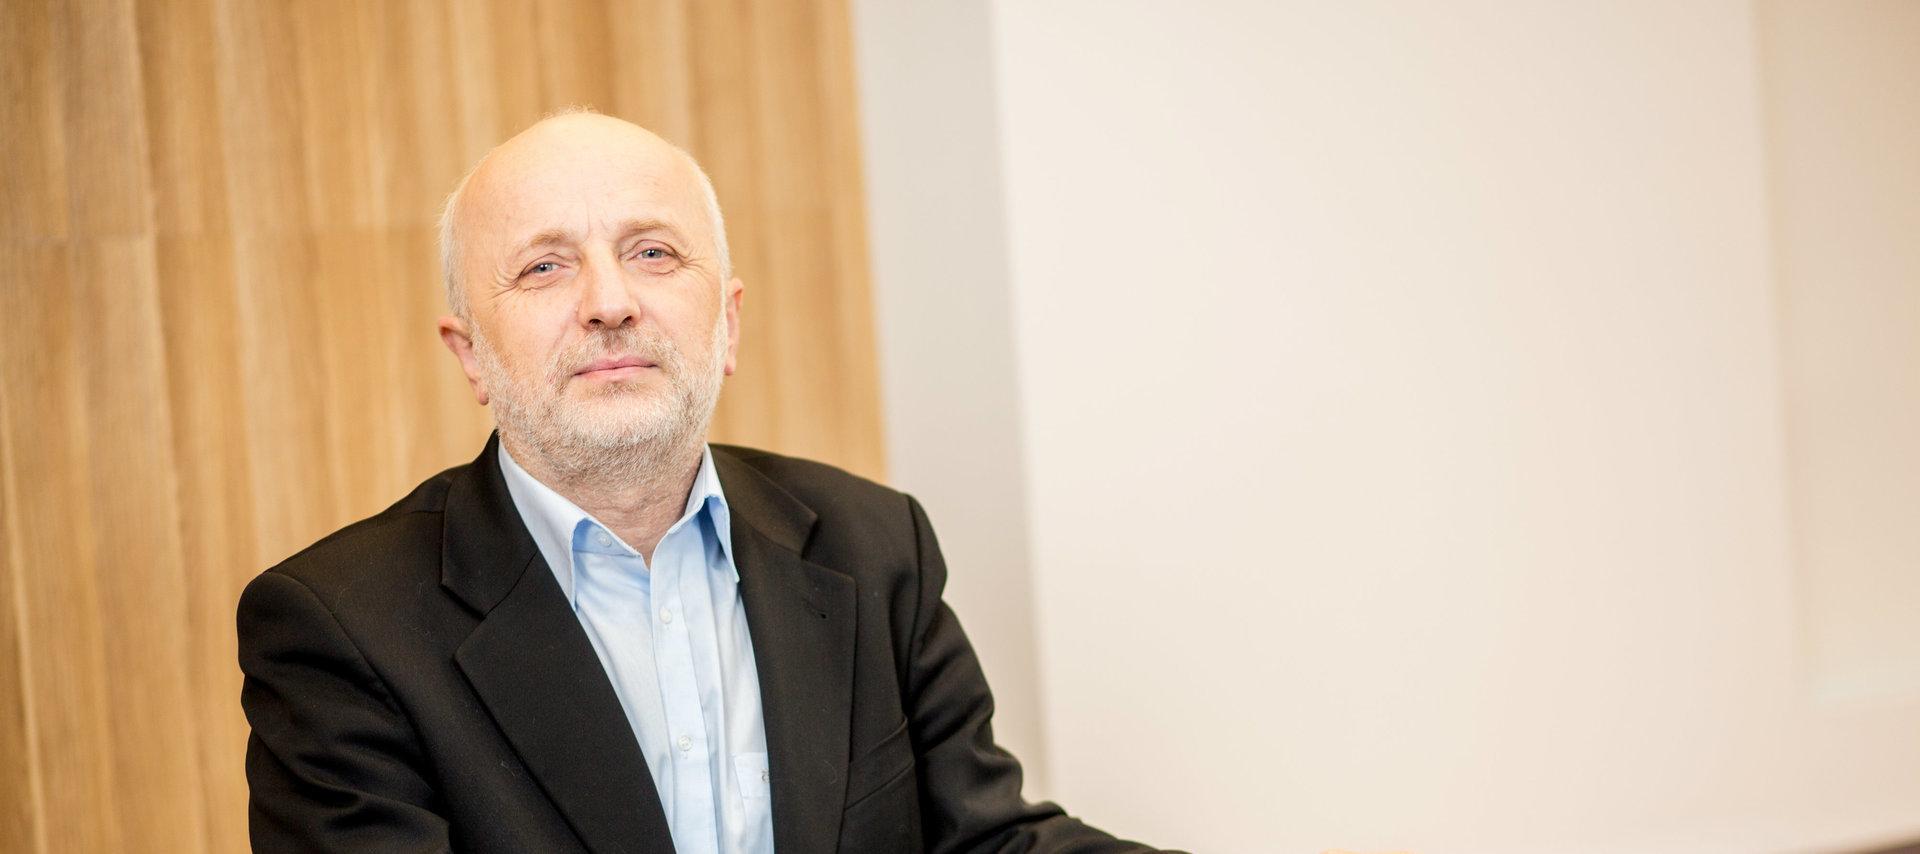 dr hab. Krzysztof Safin, prof. nadzw. WSB